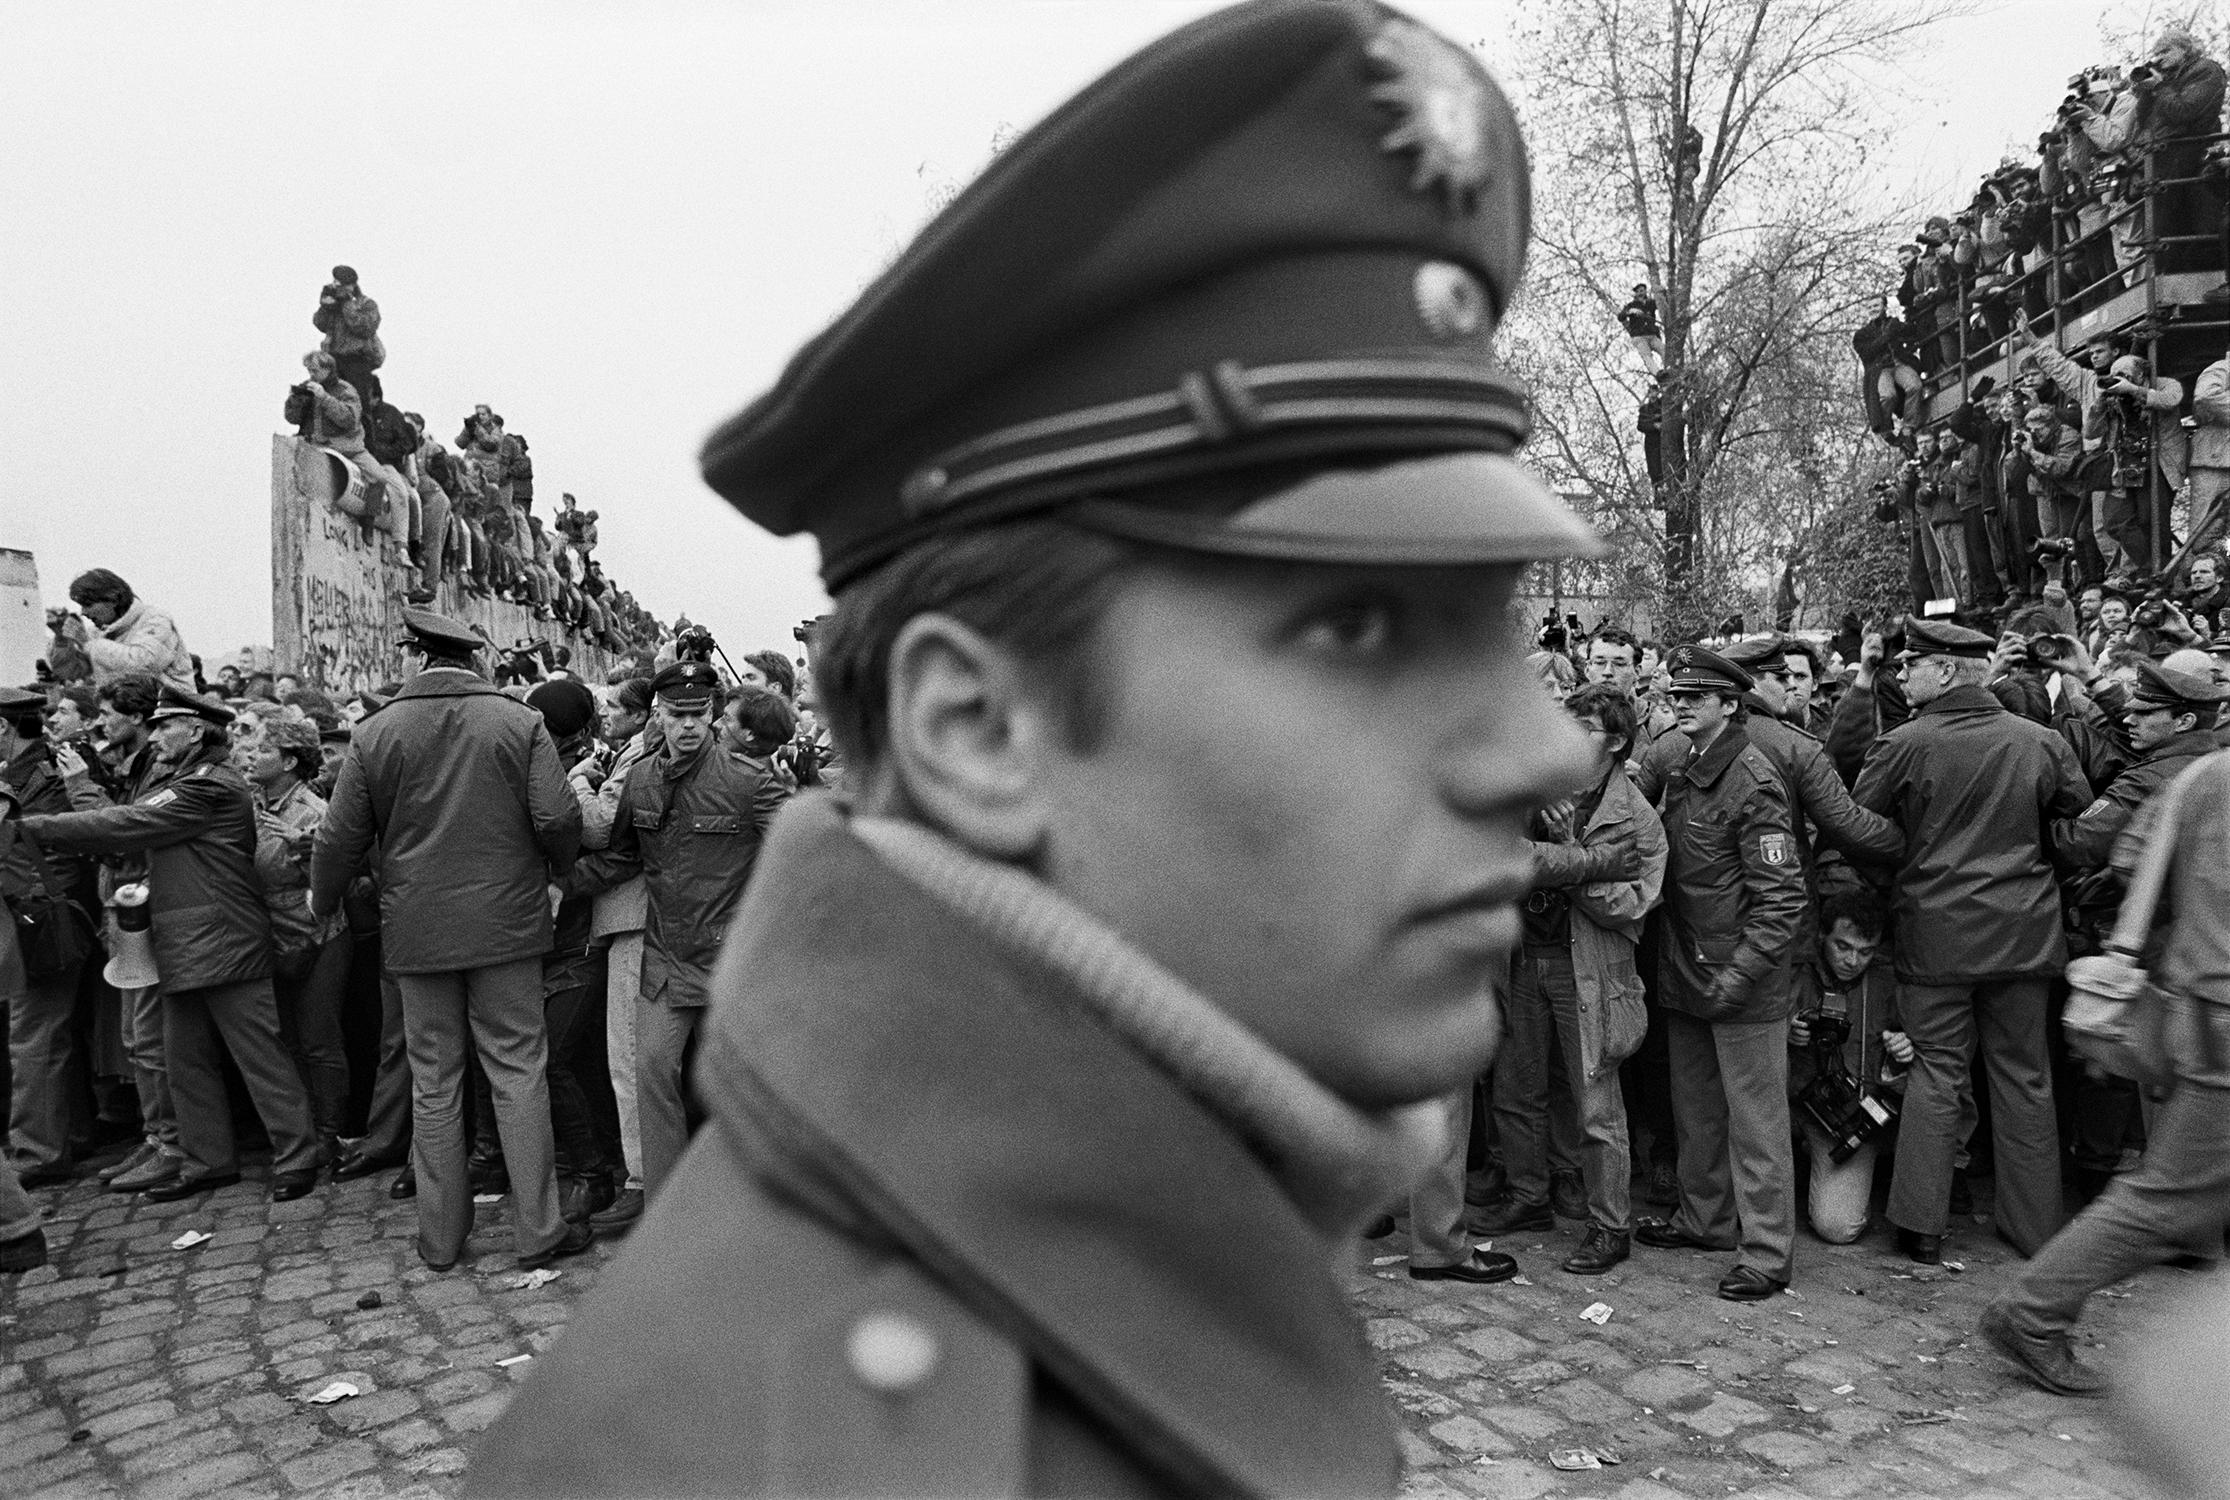 Berlin. November 1989 – Mark Power